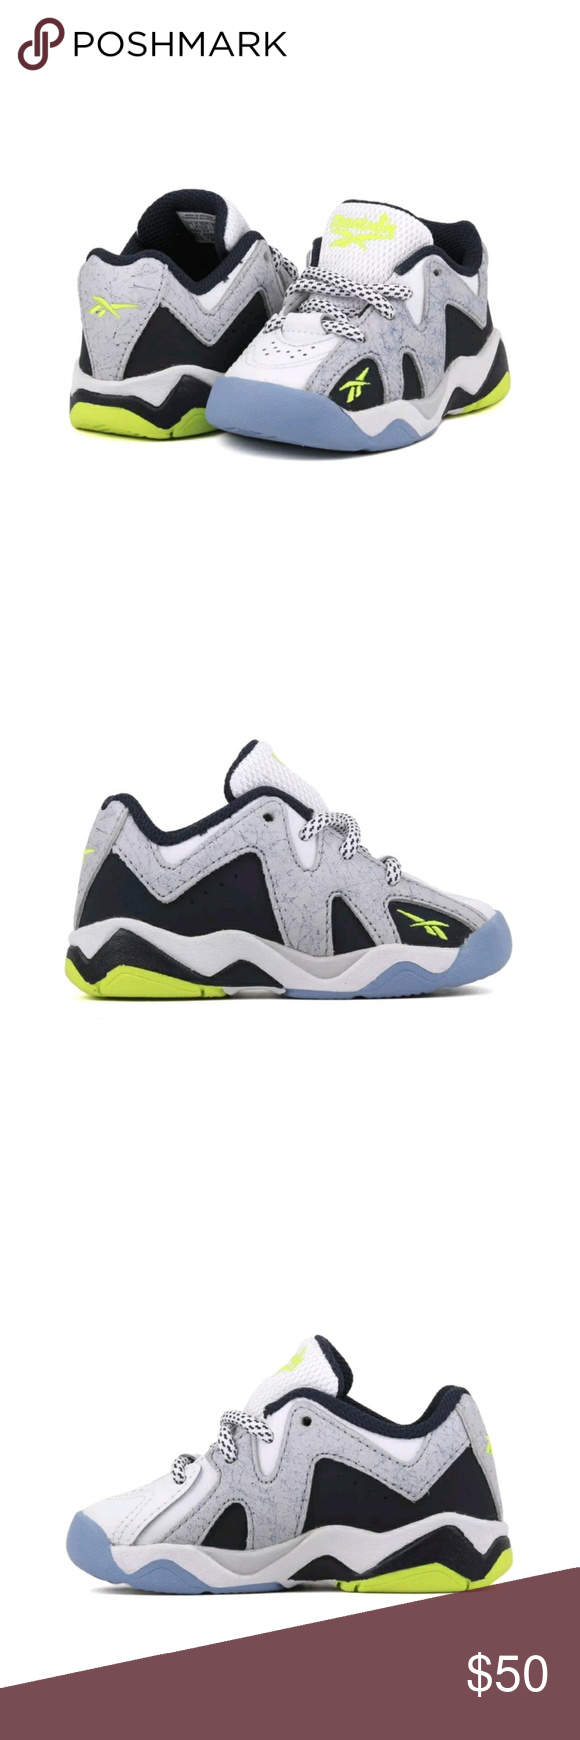 e3615cbe574 Reebok Kamikaze Sneakers infant shoe size 4 Authentic Reebok Super fast  worldwide shipping READY TO SHIP